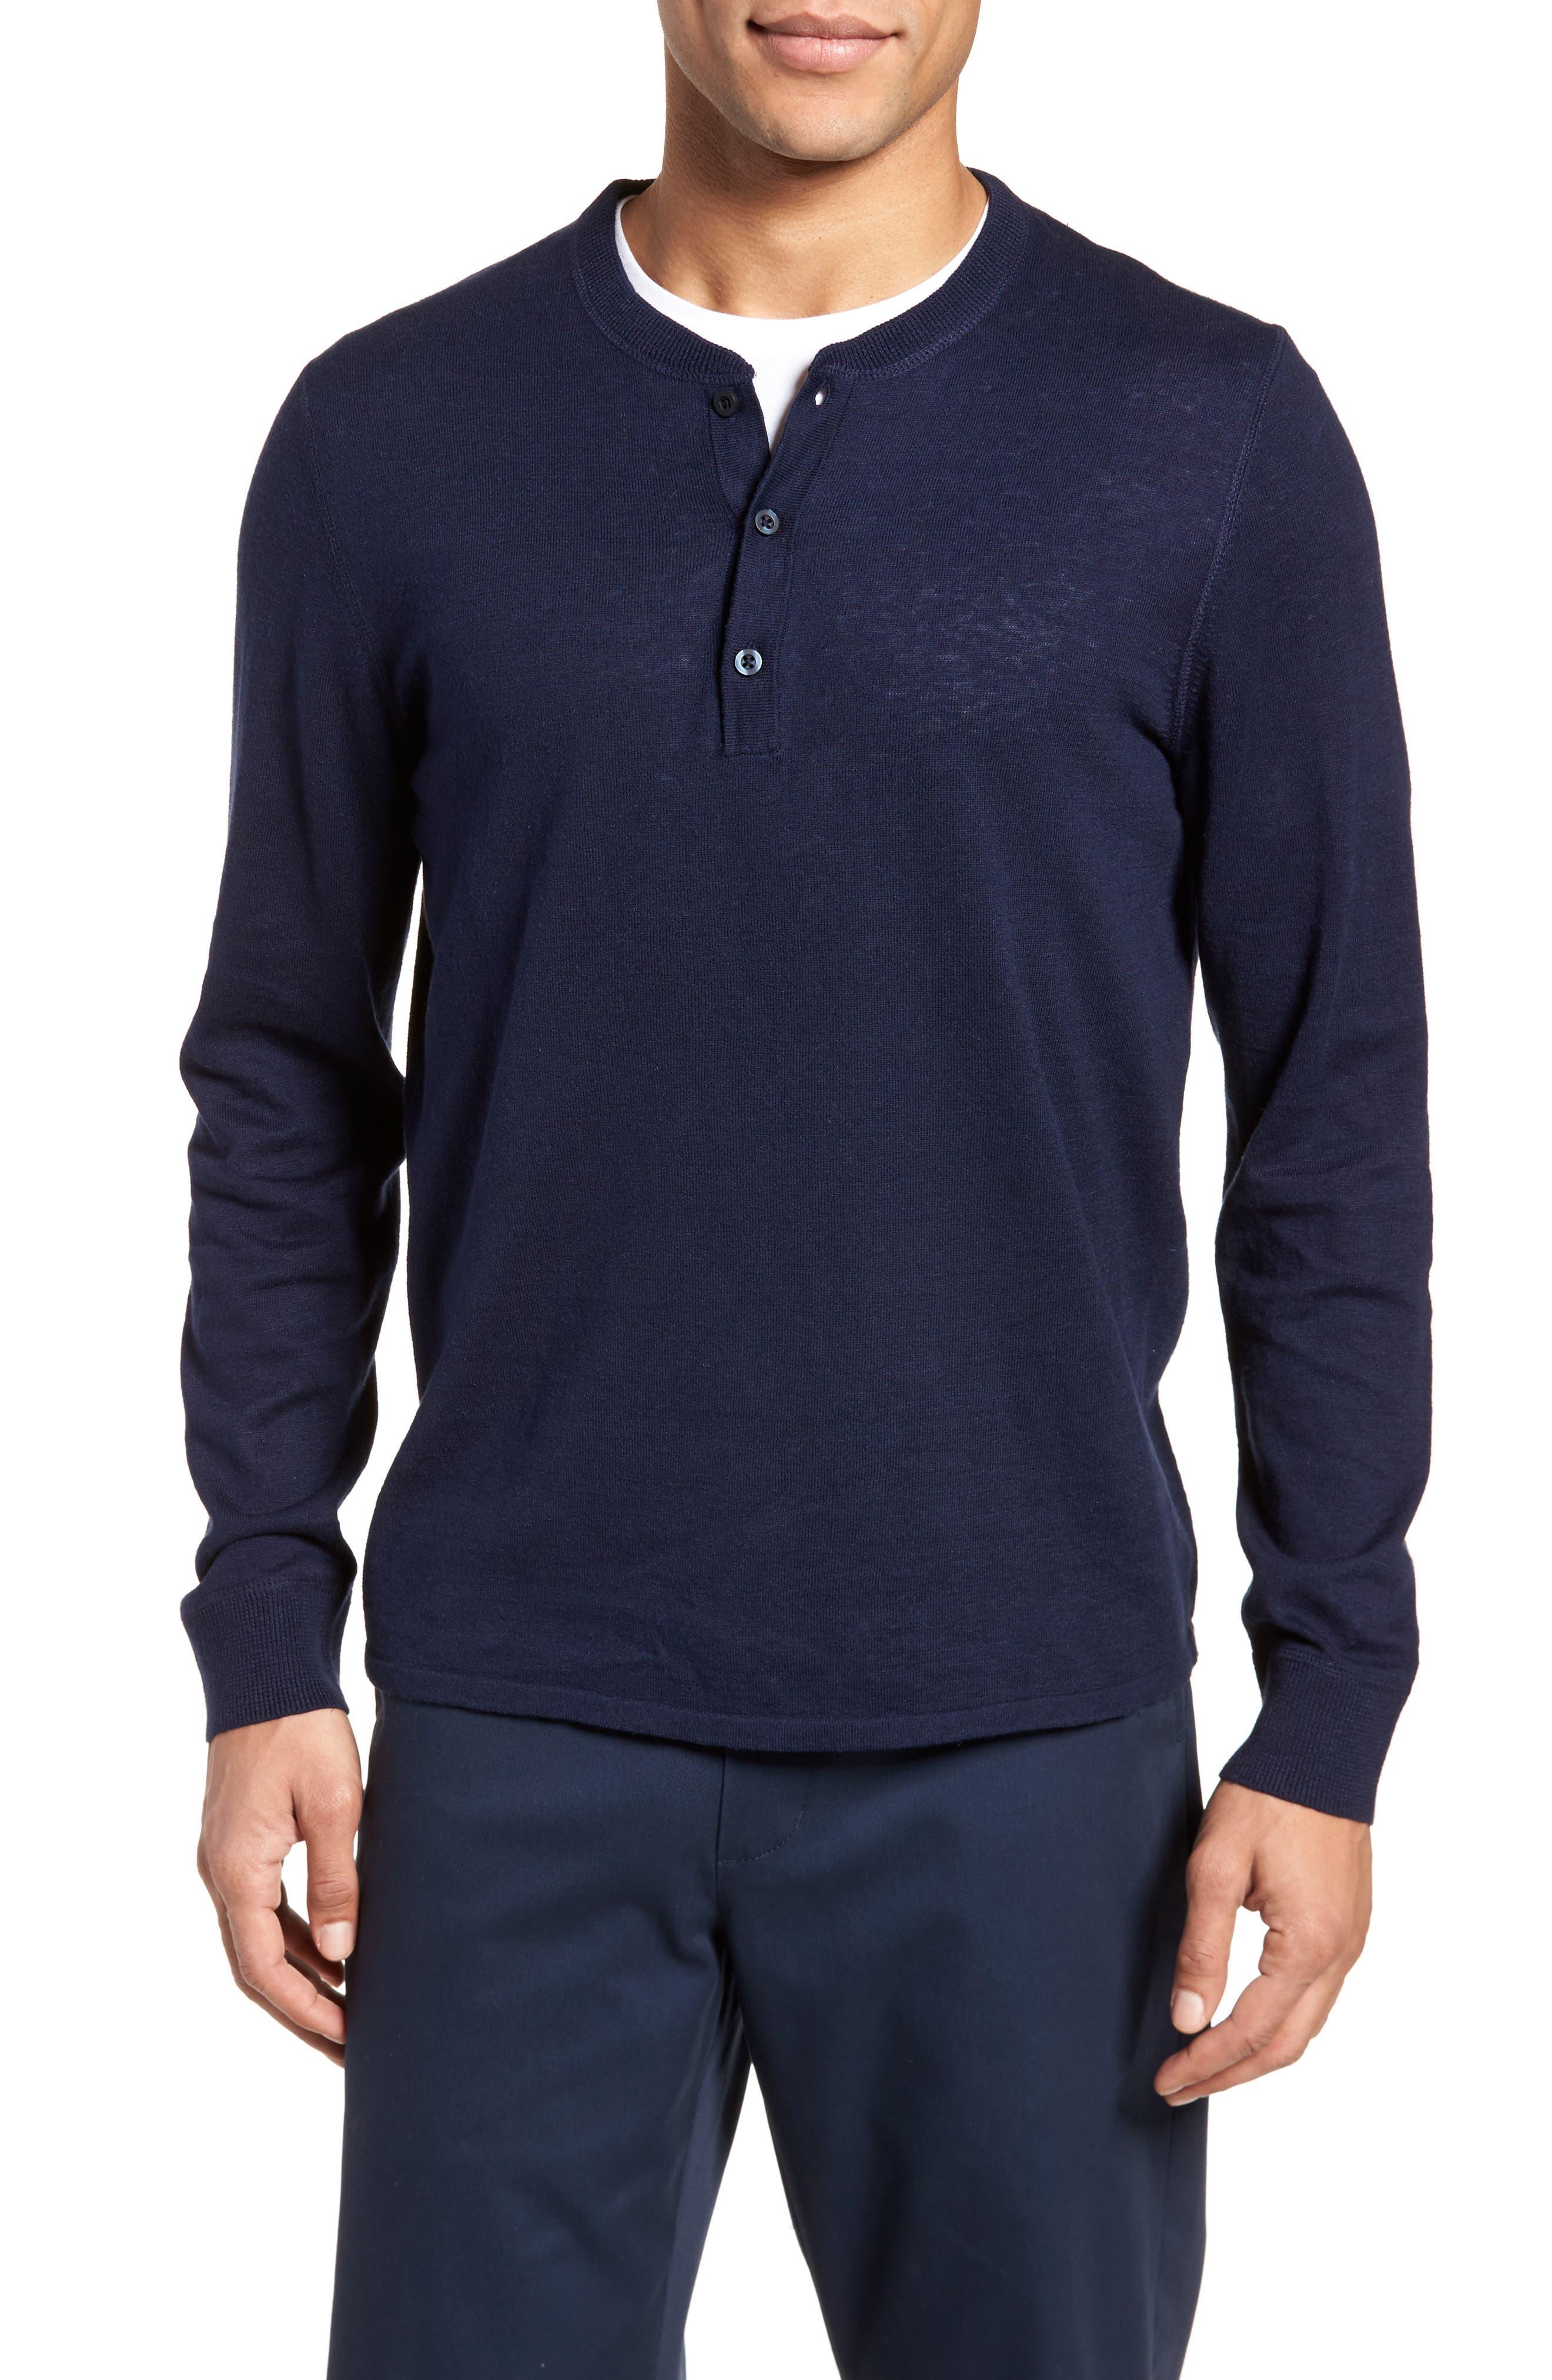 Alternate Image 1 Selected - Nordstrom Men's Shop Long Sleeve Cotton & Linen Blend Henley